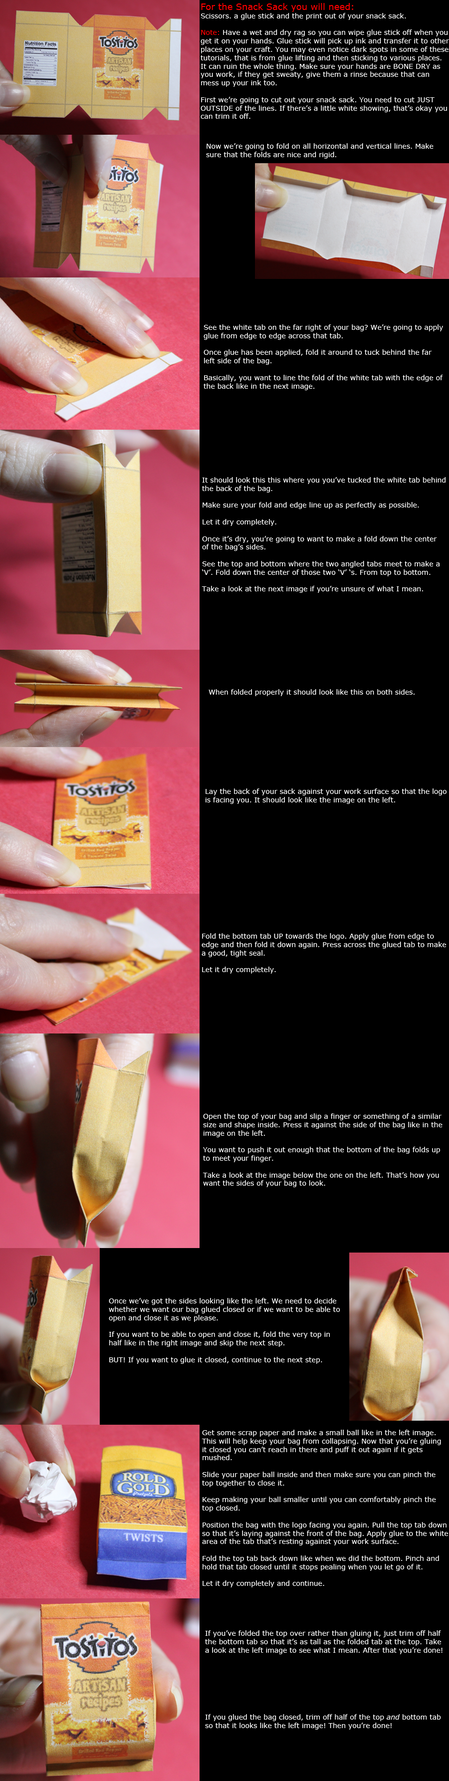 Snack Sack Tutorial by QTRQ